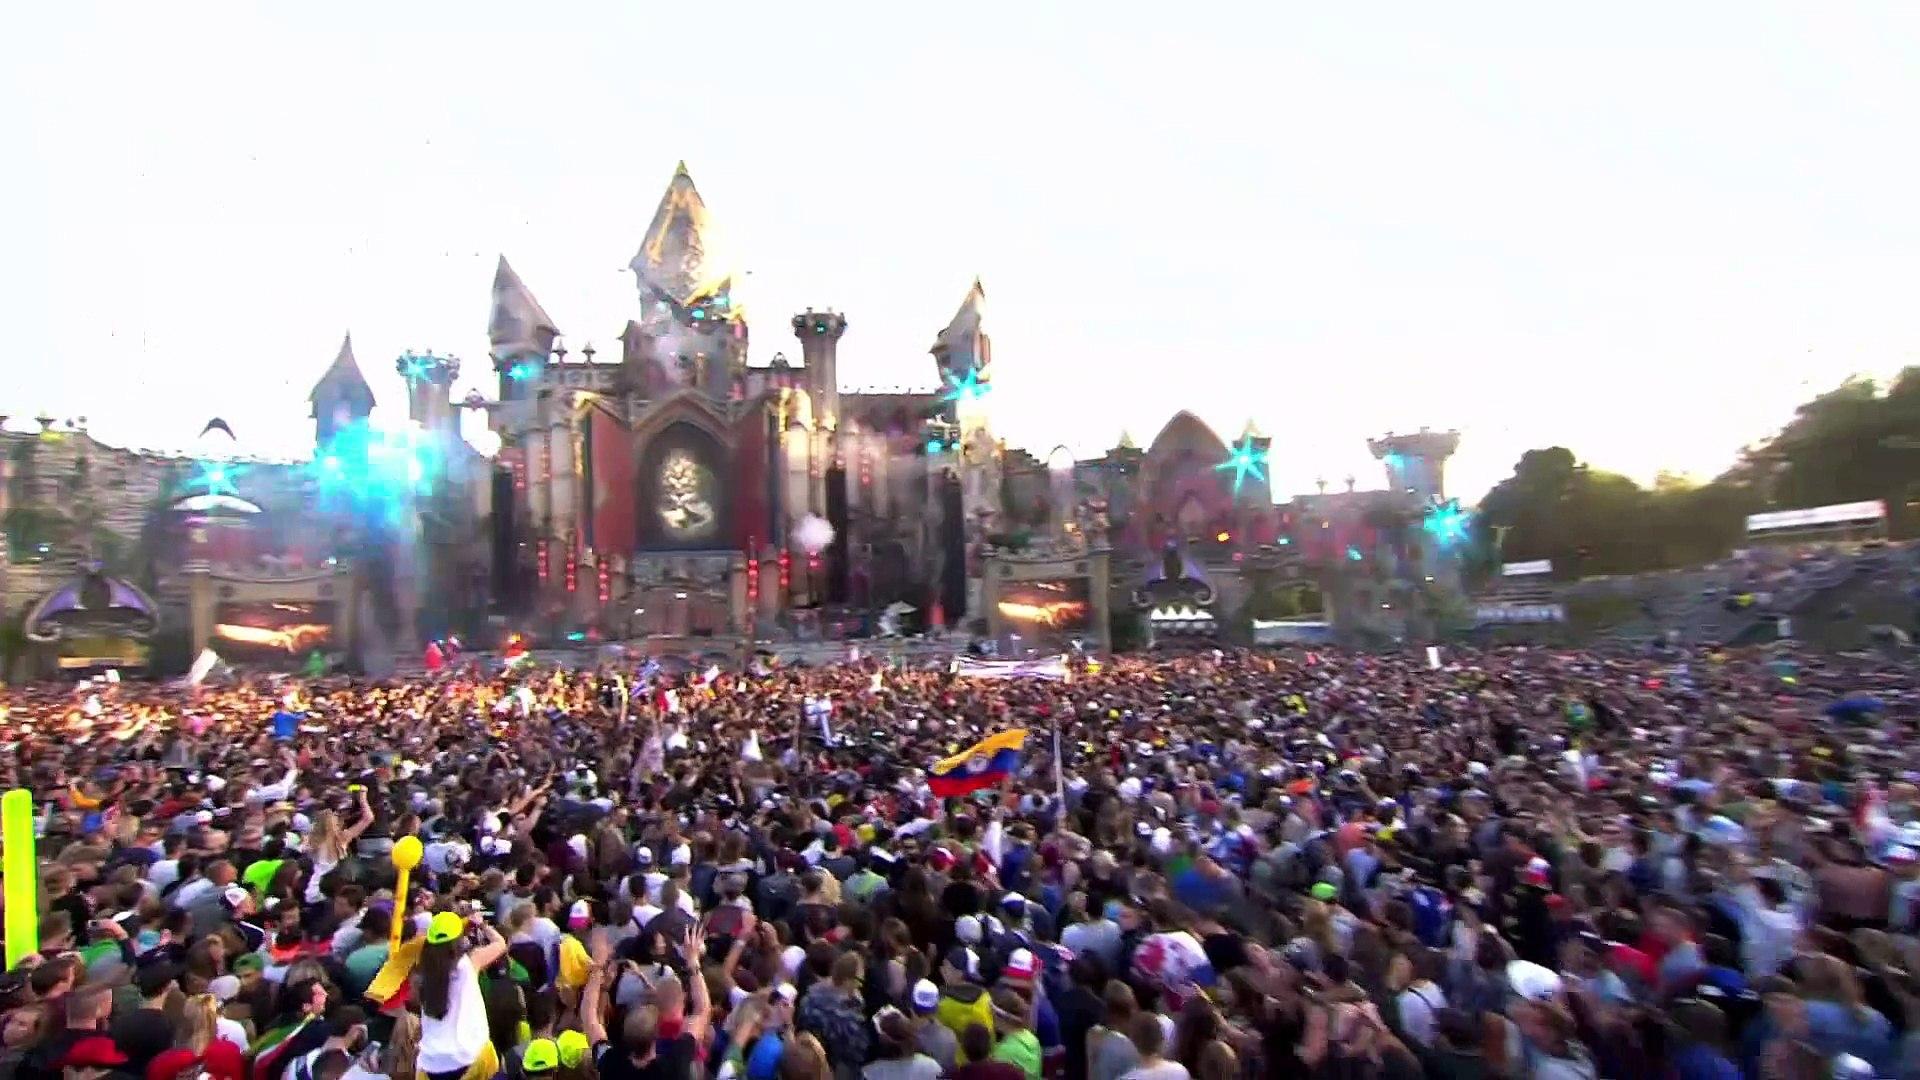 Martin Garrix - Live at Tomorrowland 2015 [FULL HD]